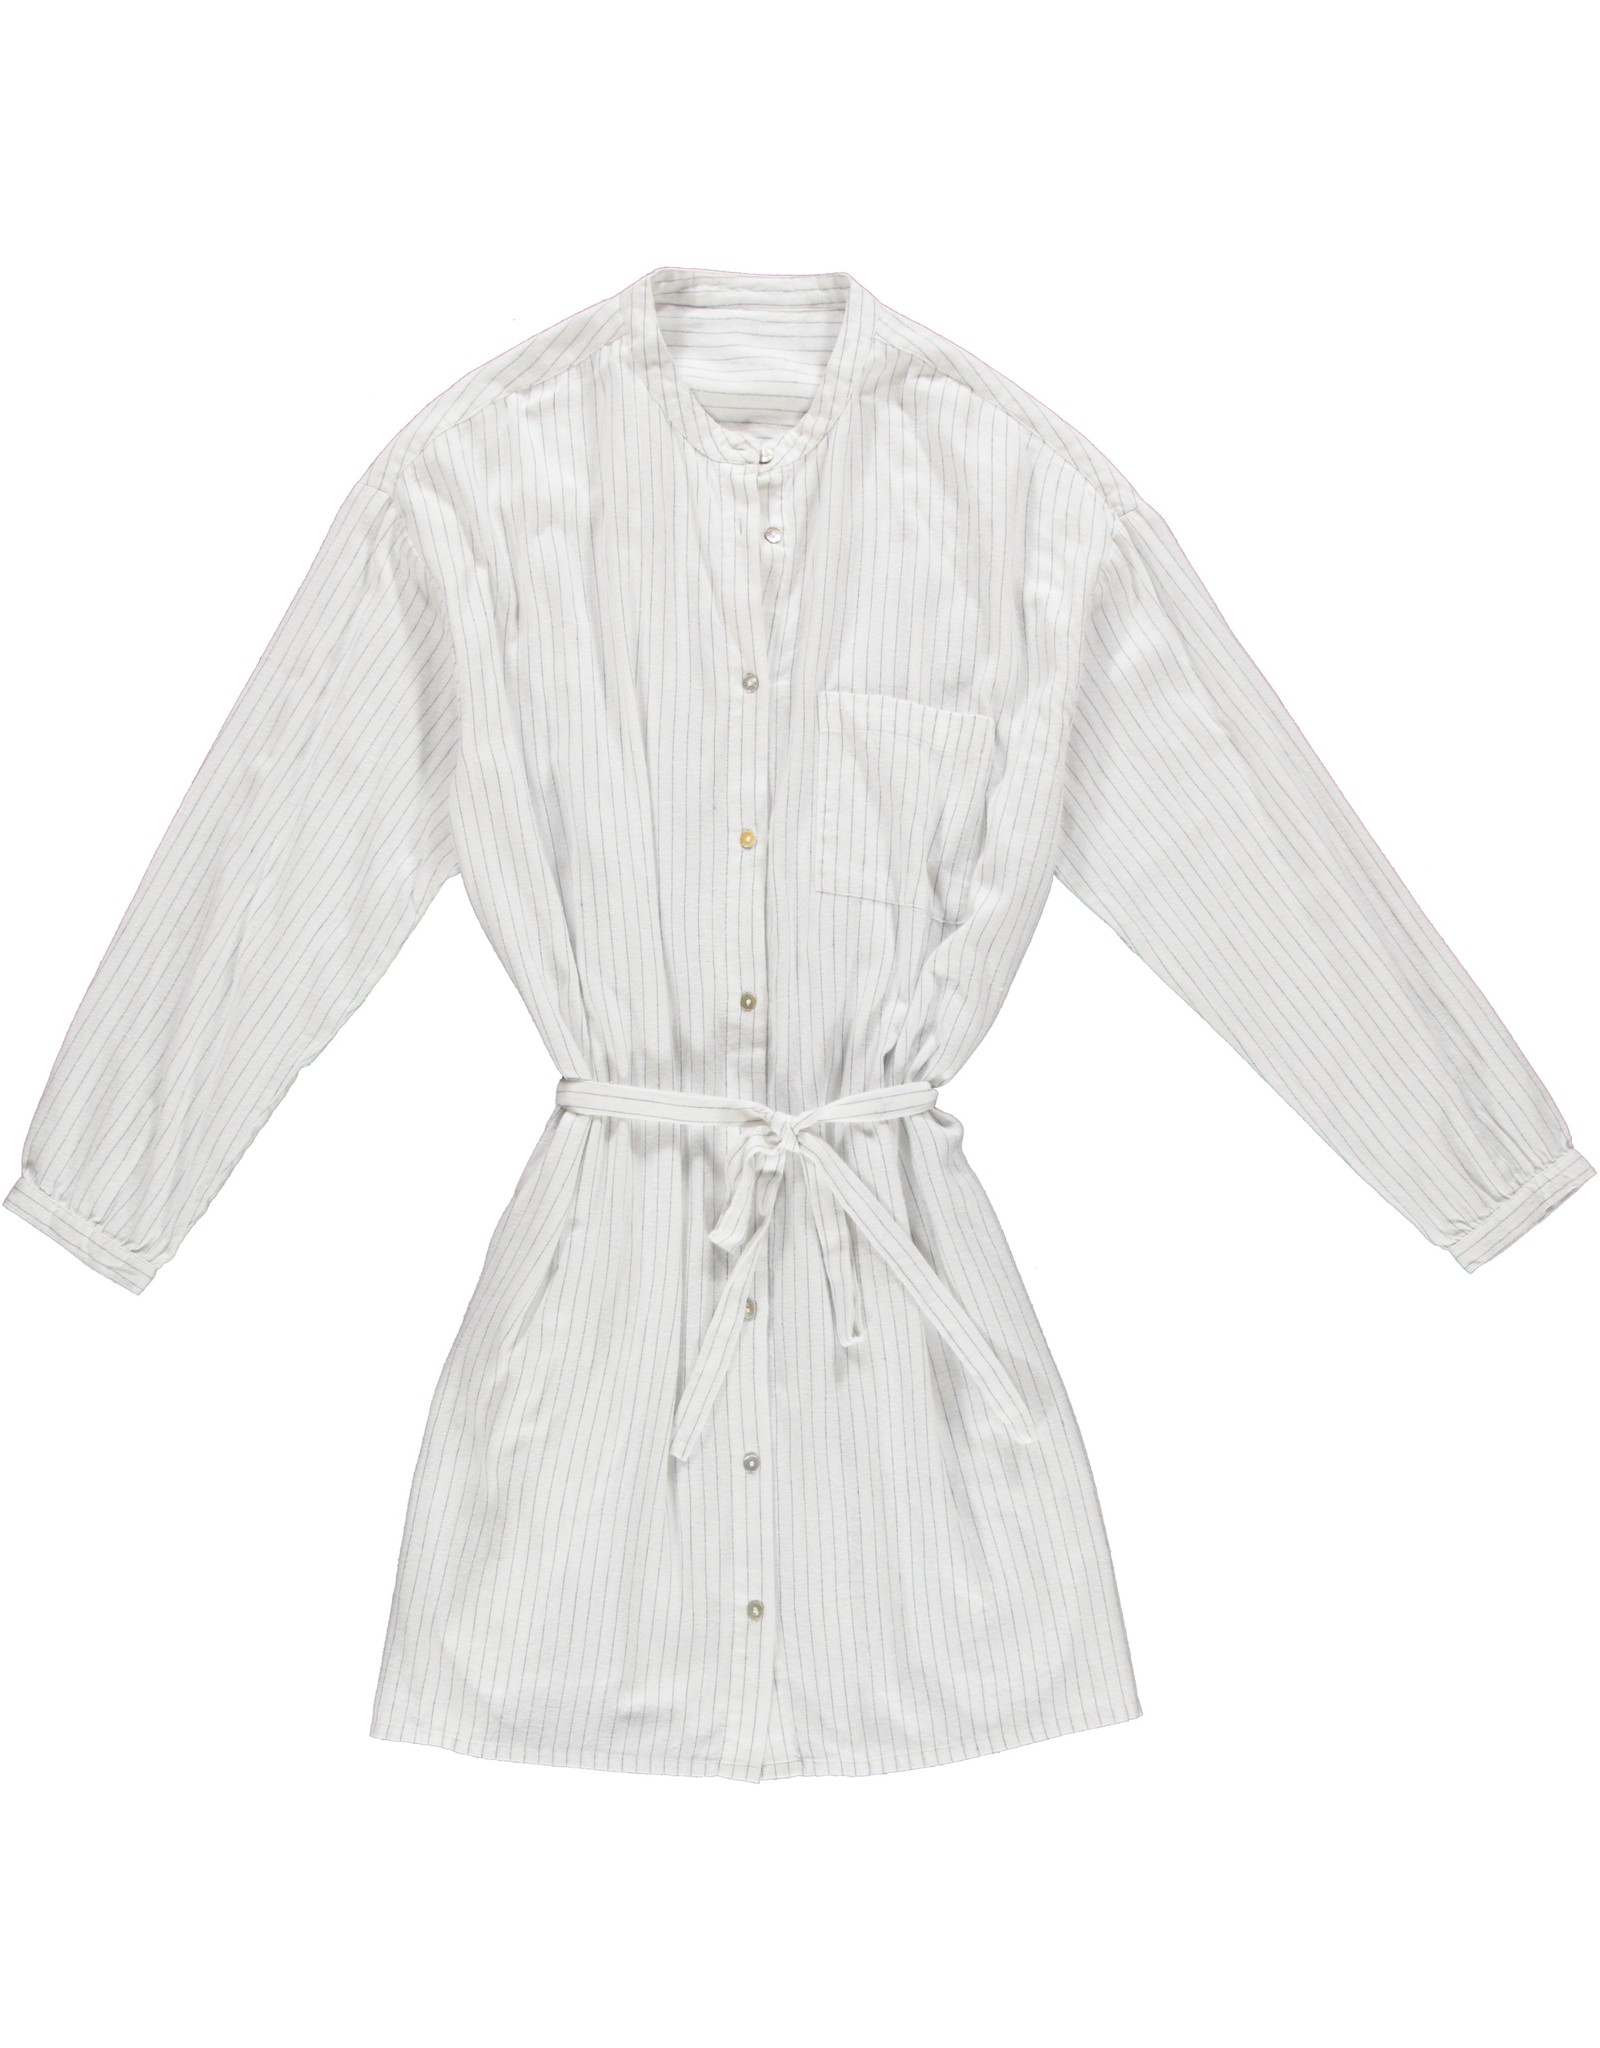 Dorélit Florance   Nightdress   Pin Stripe